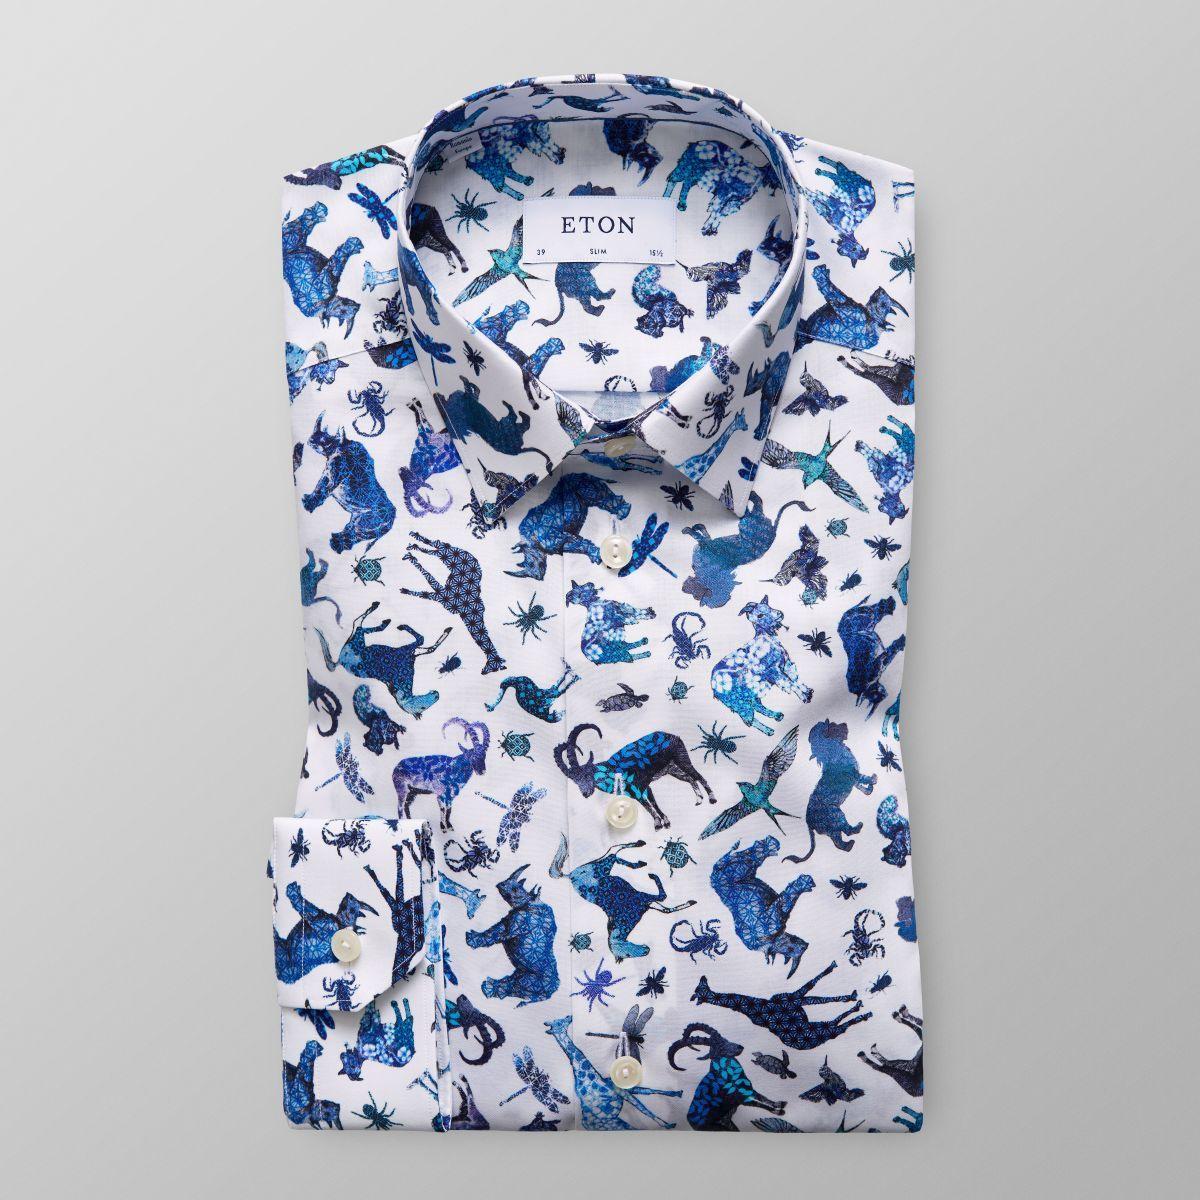 Animal Print Shirt Slim Fit Eton Shirts Us Printed In Andrew Smith Floral Navy Xxl